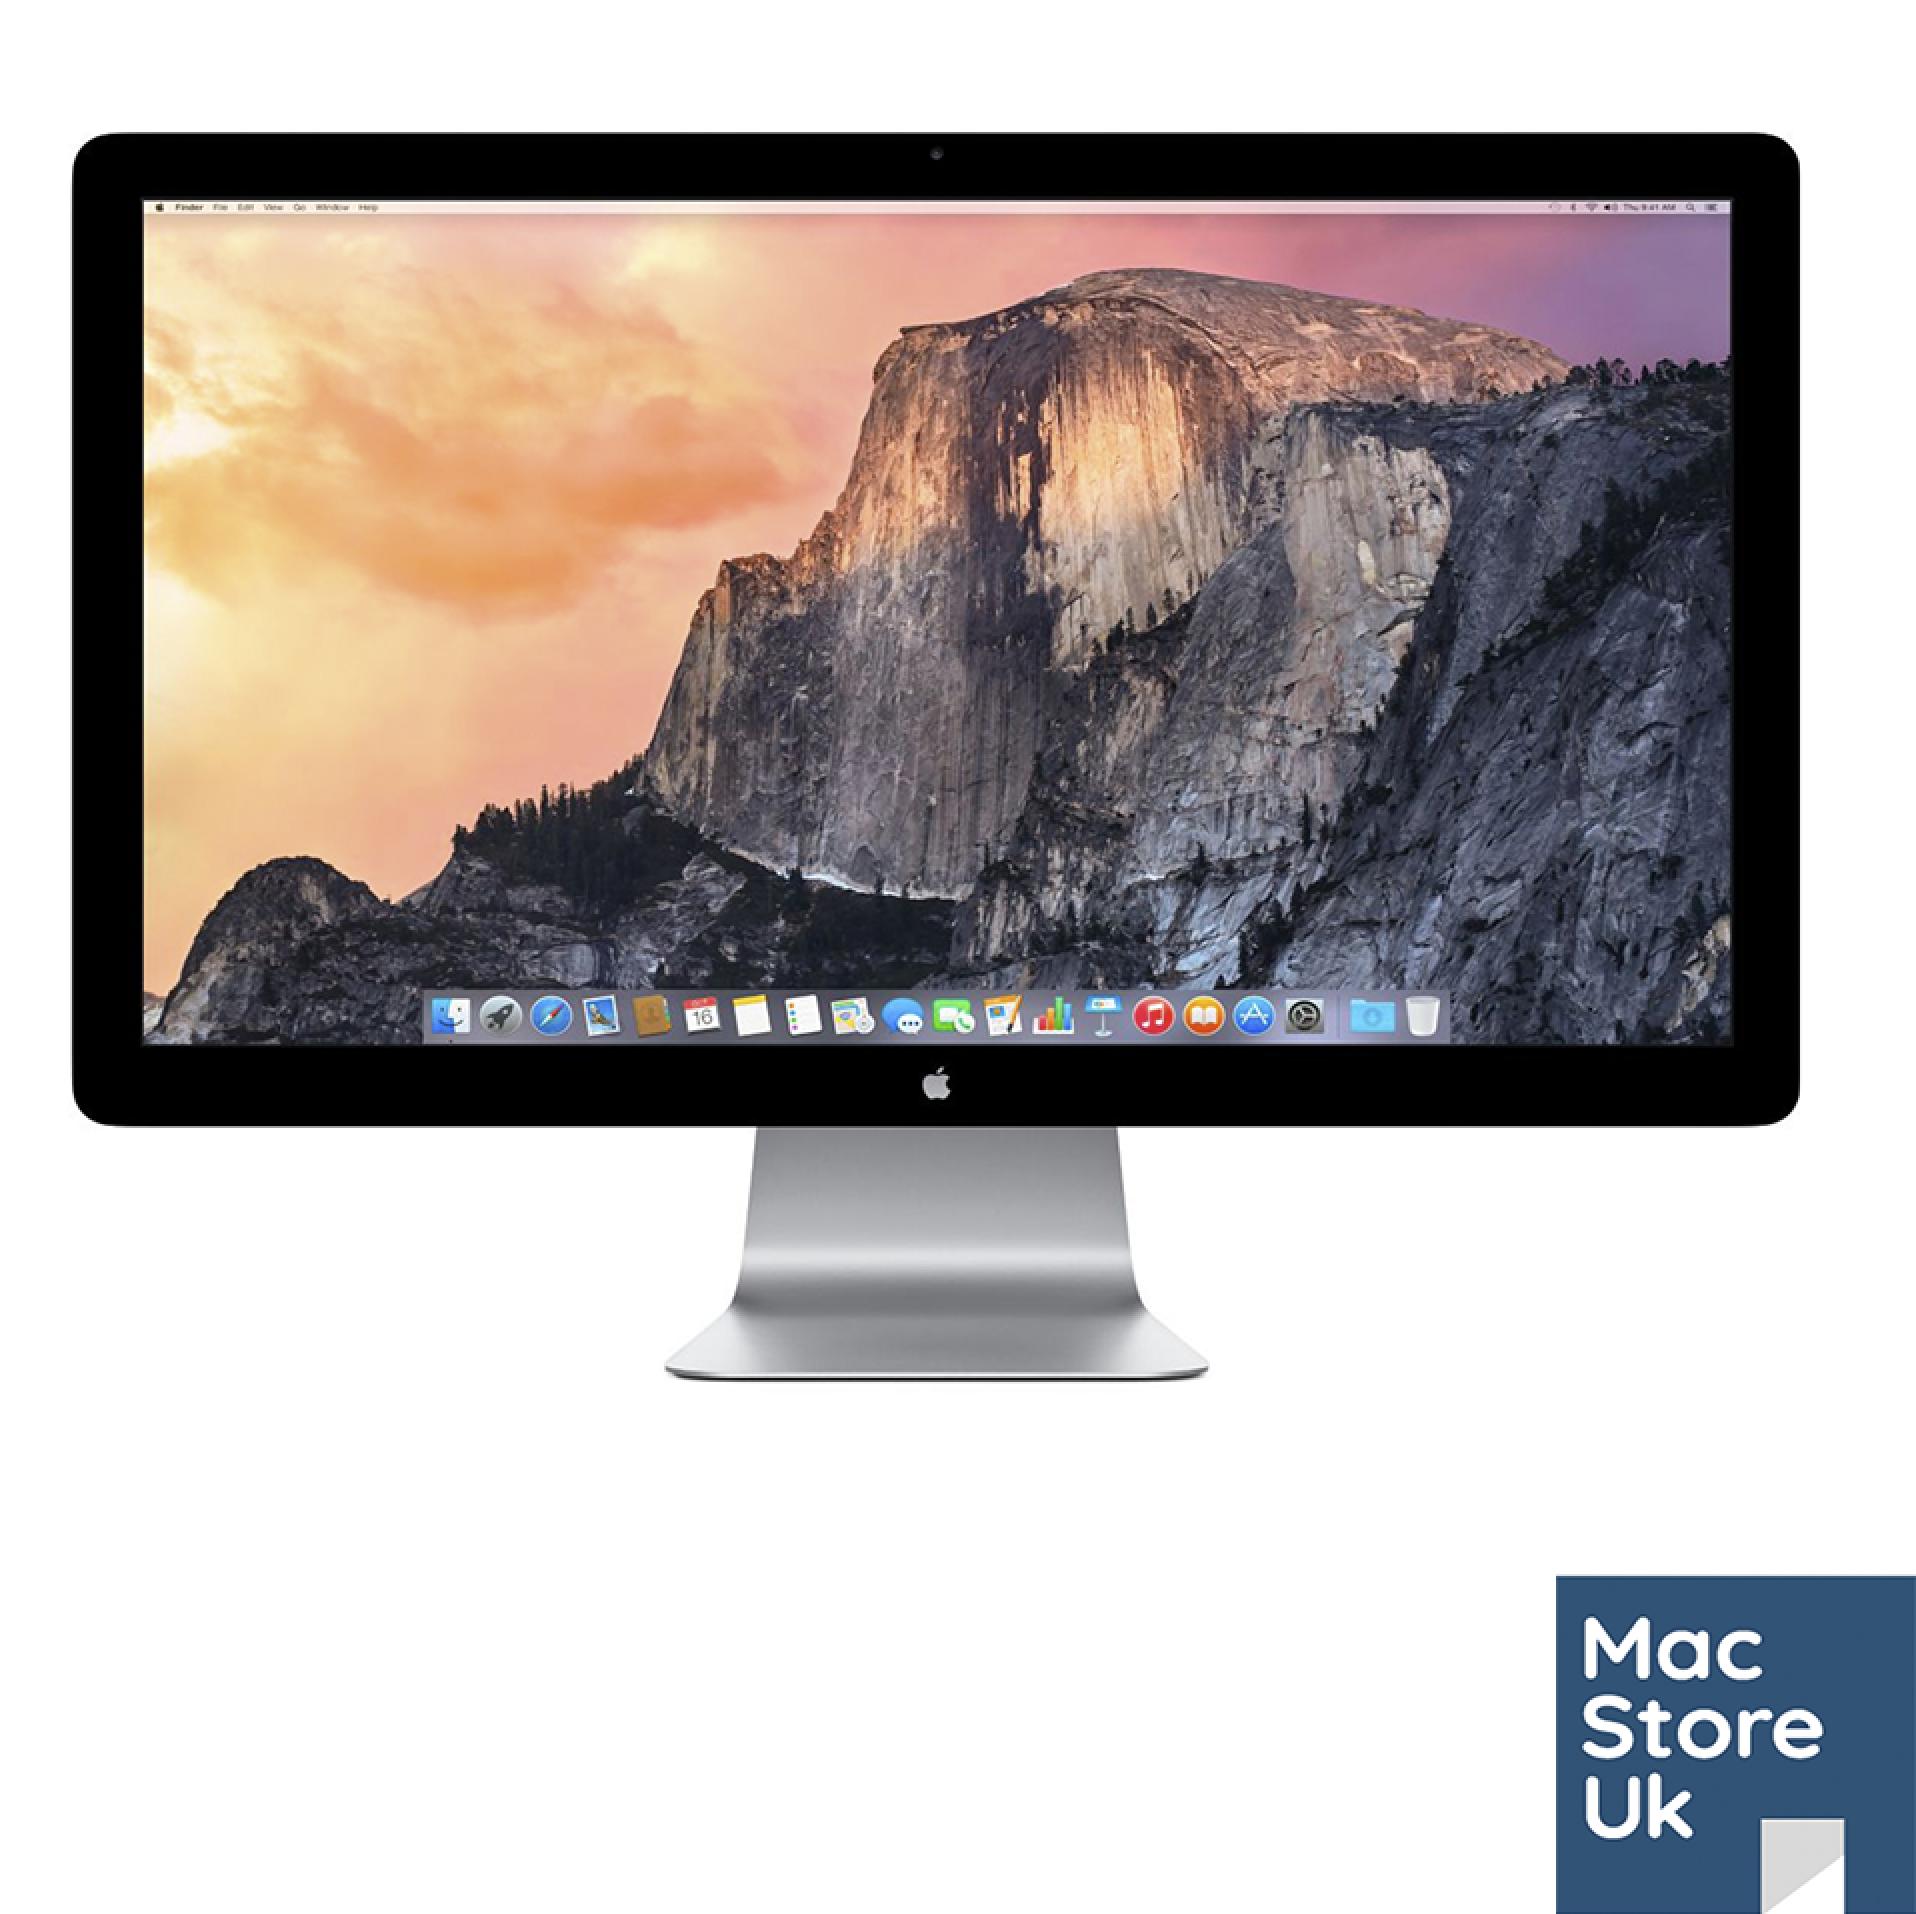 Mac store UK Nvidia GTX 1080Ti 11GB by MacVidCards - Mac